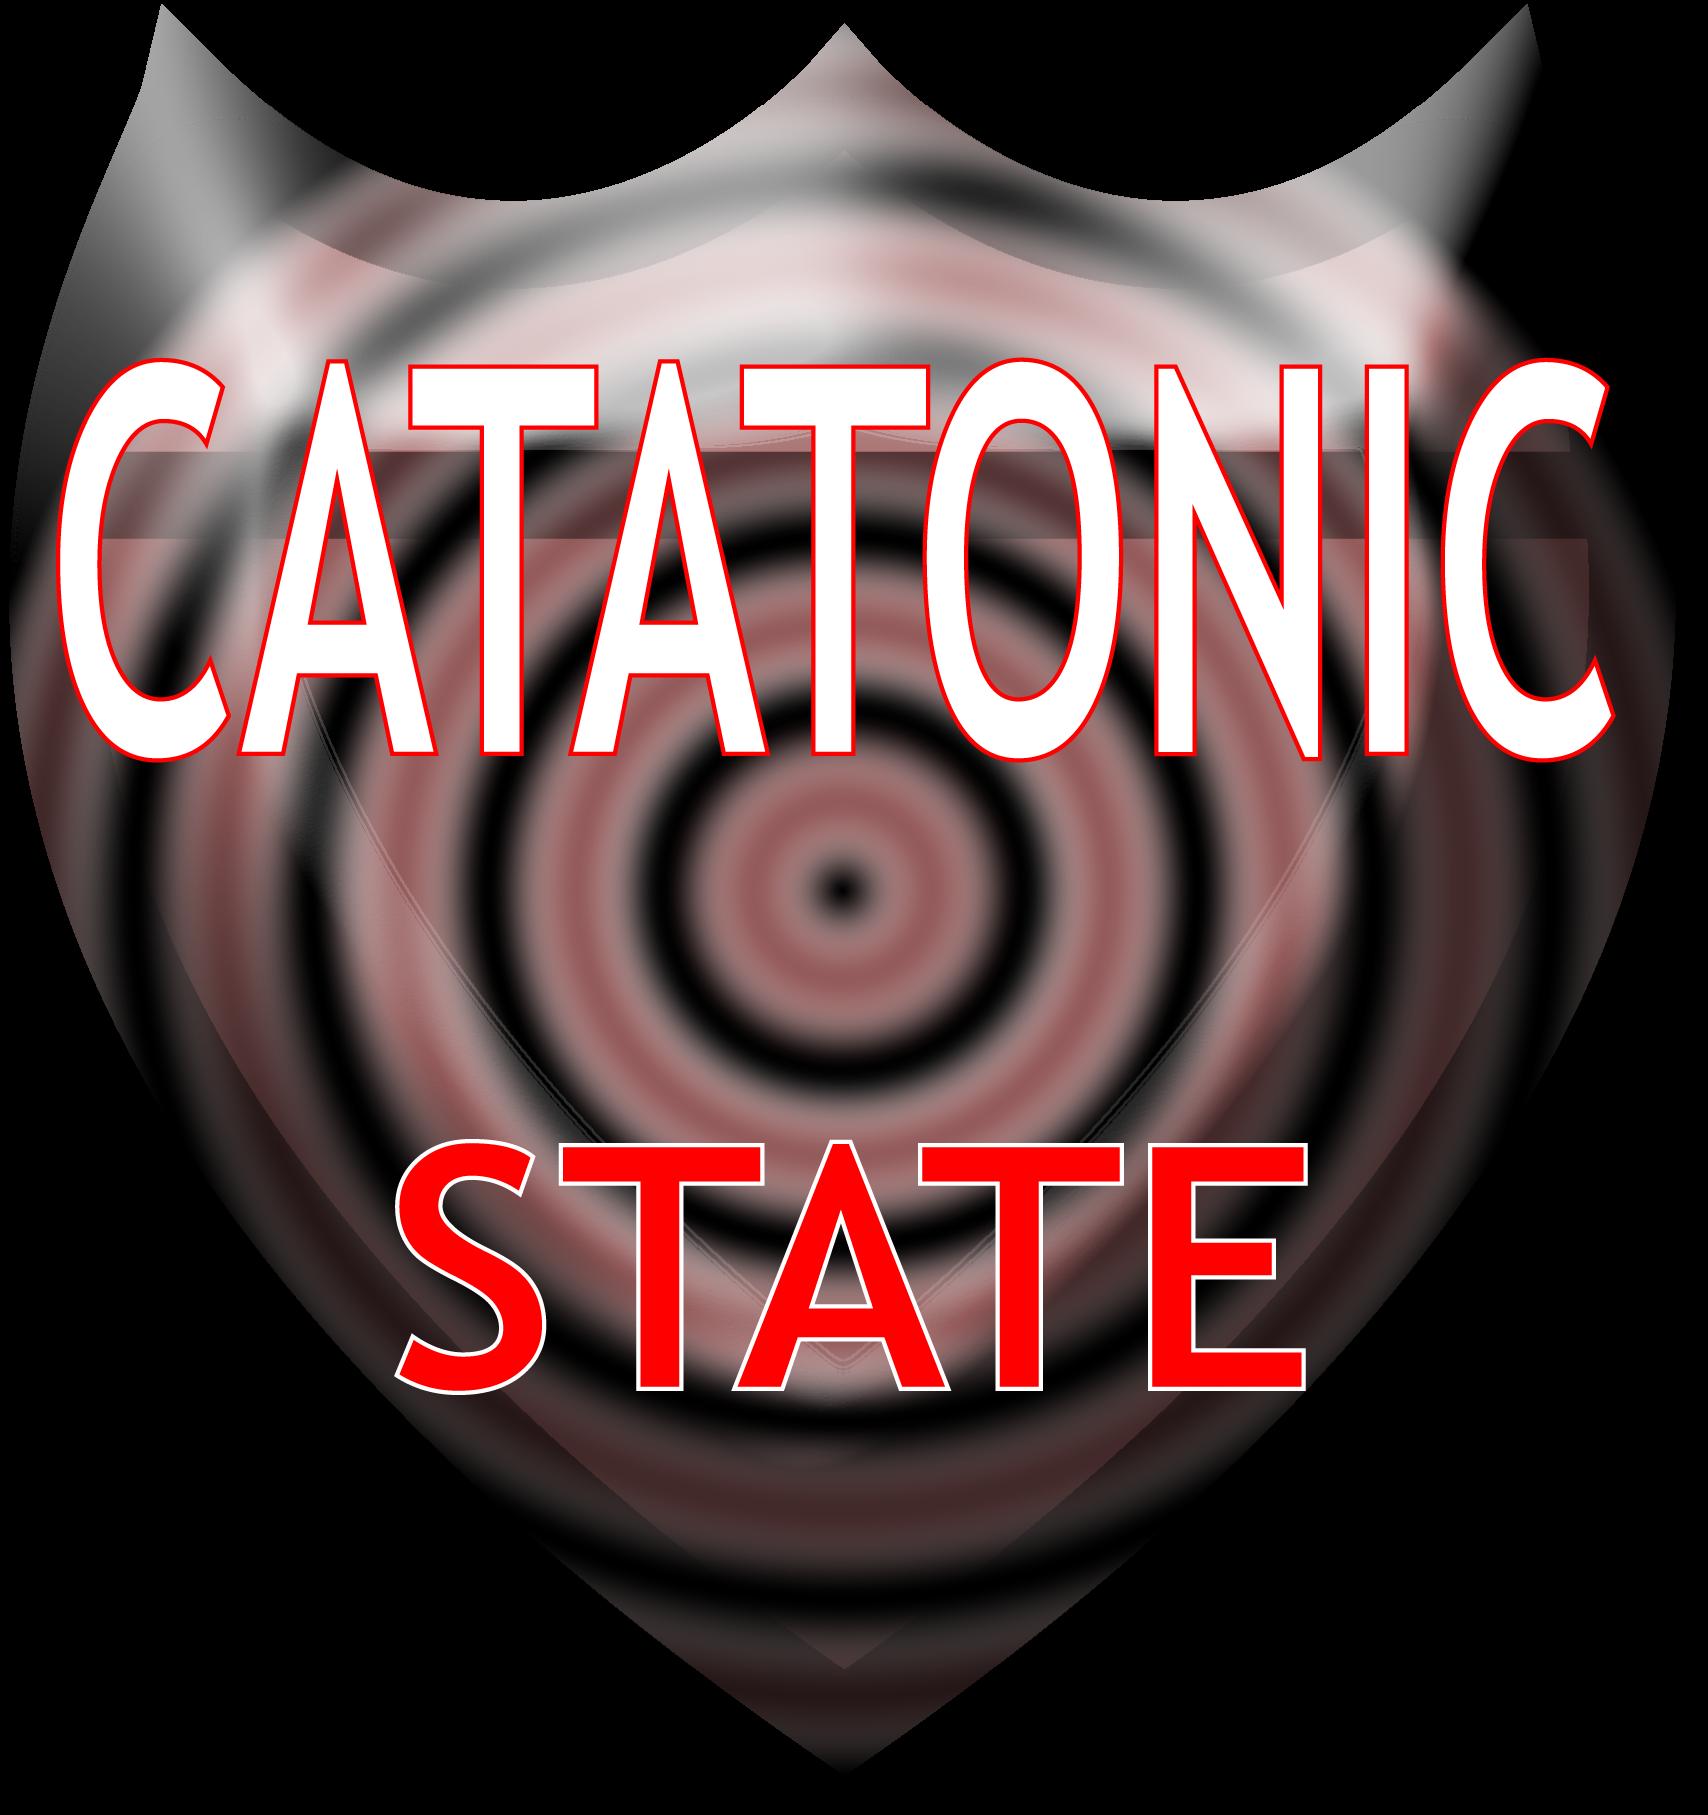 Catatonic State Twilight Zone